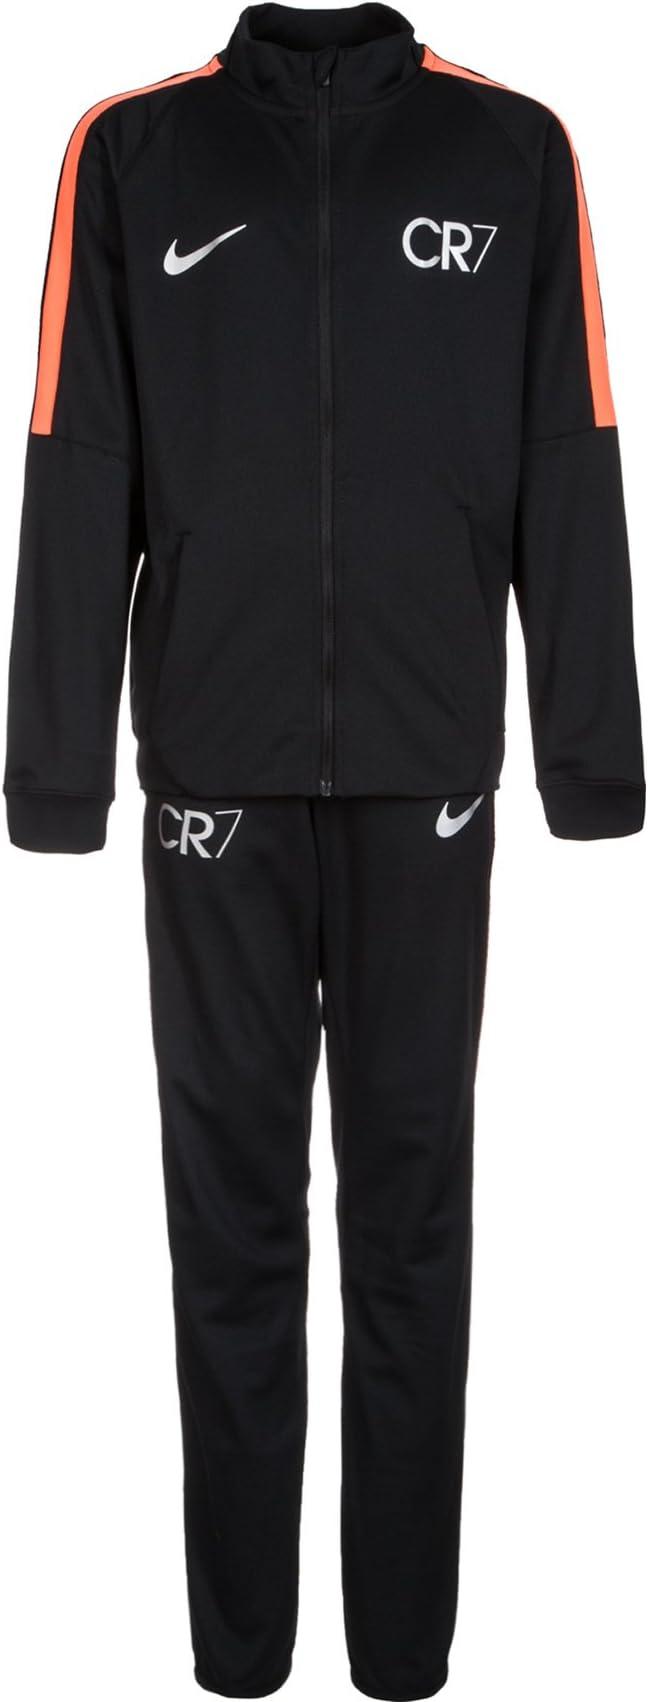 Nike Dry Squad CR7 Chándal para niños, negro / naranja: Amazon.es ...